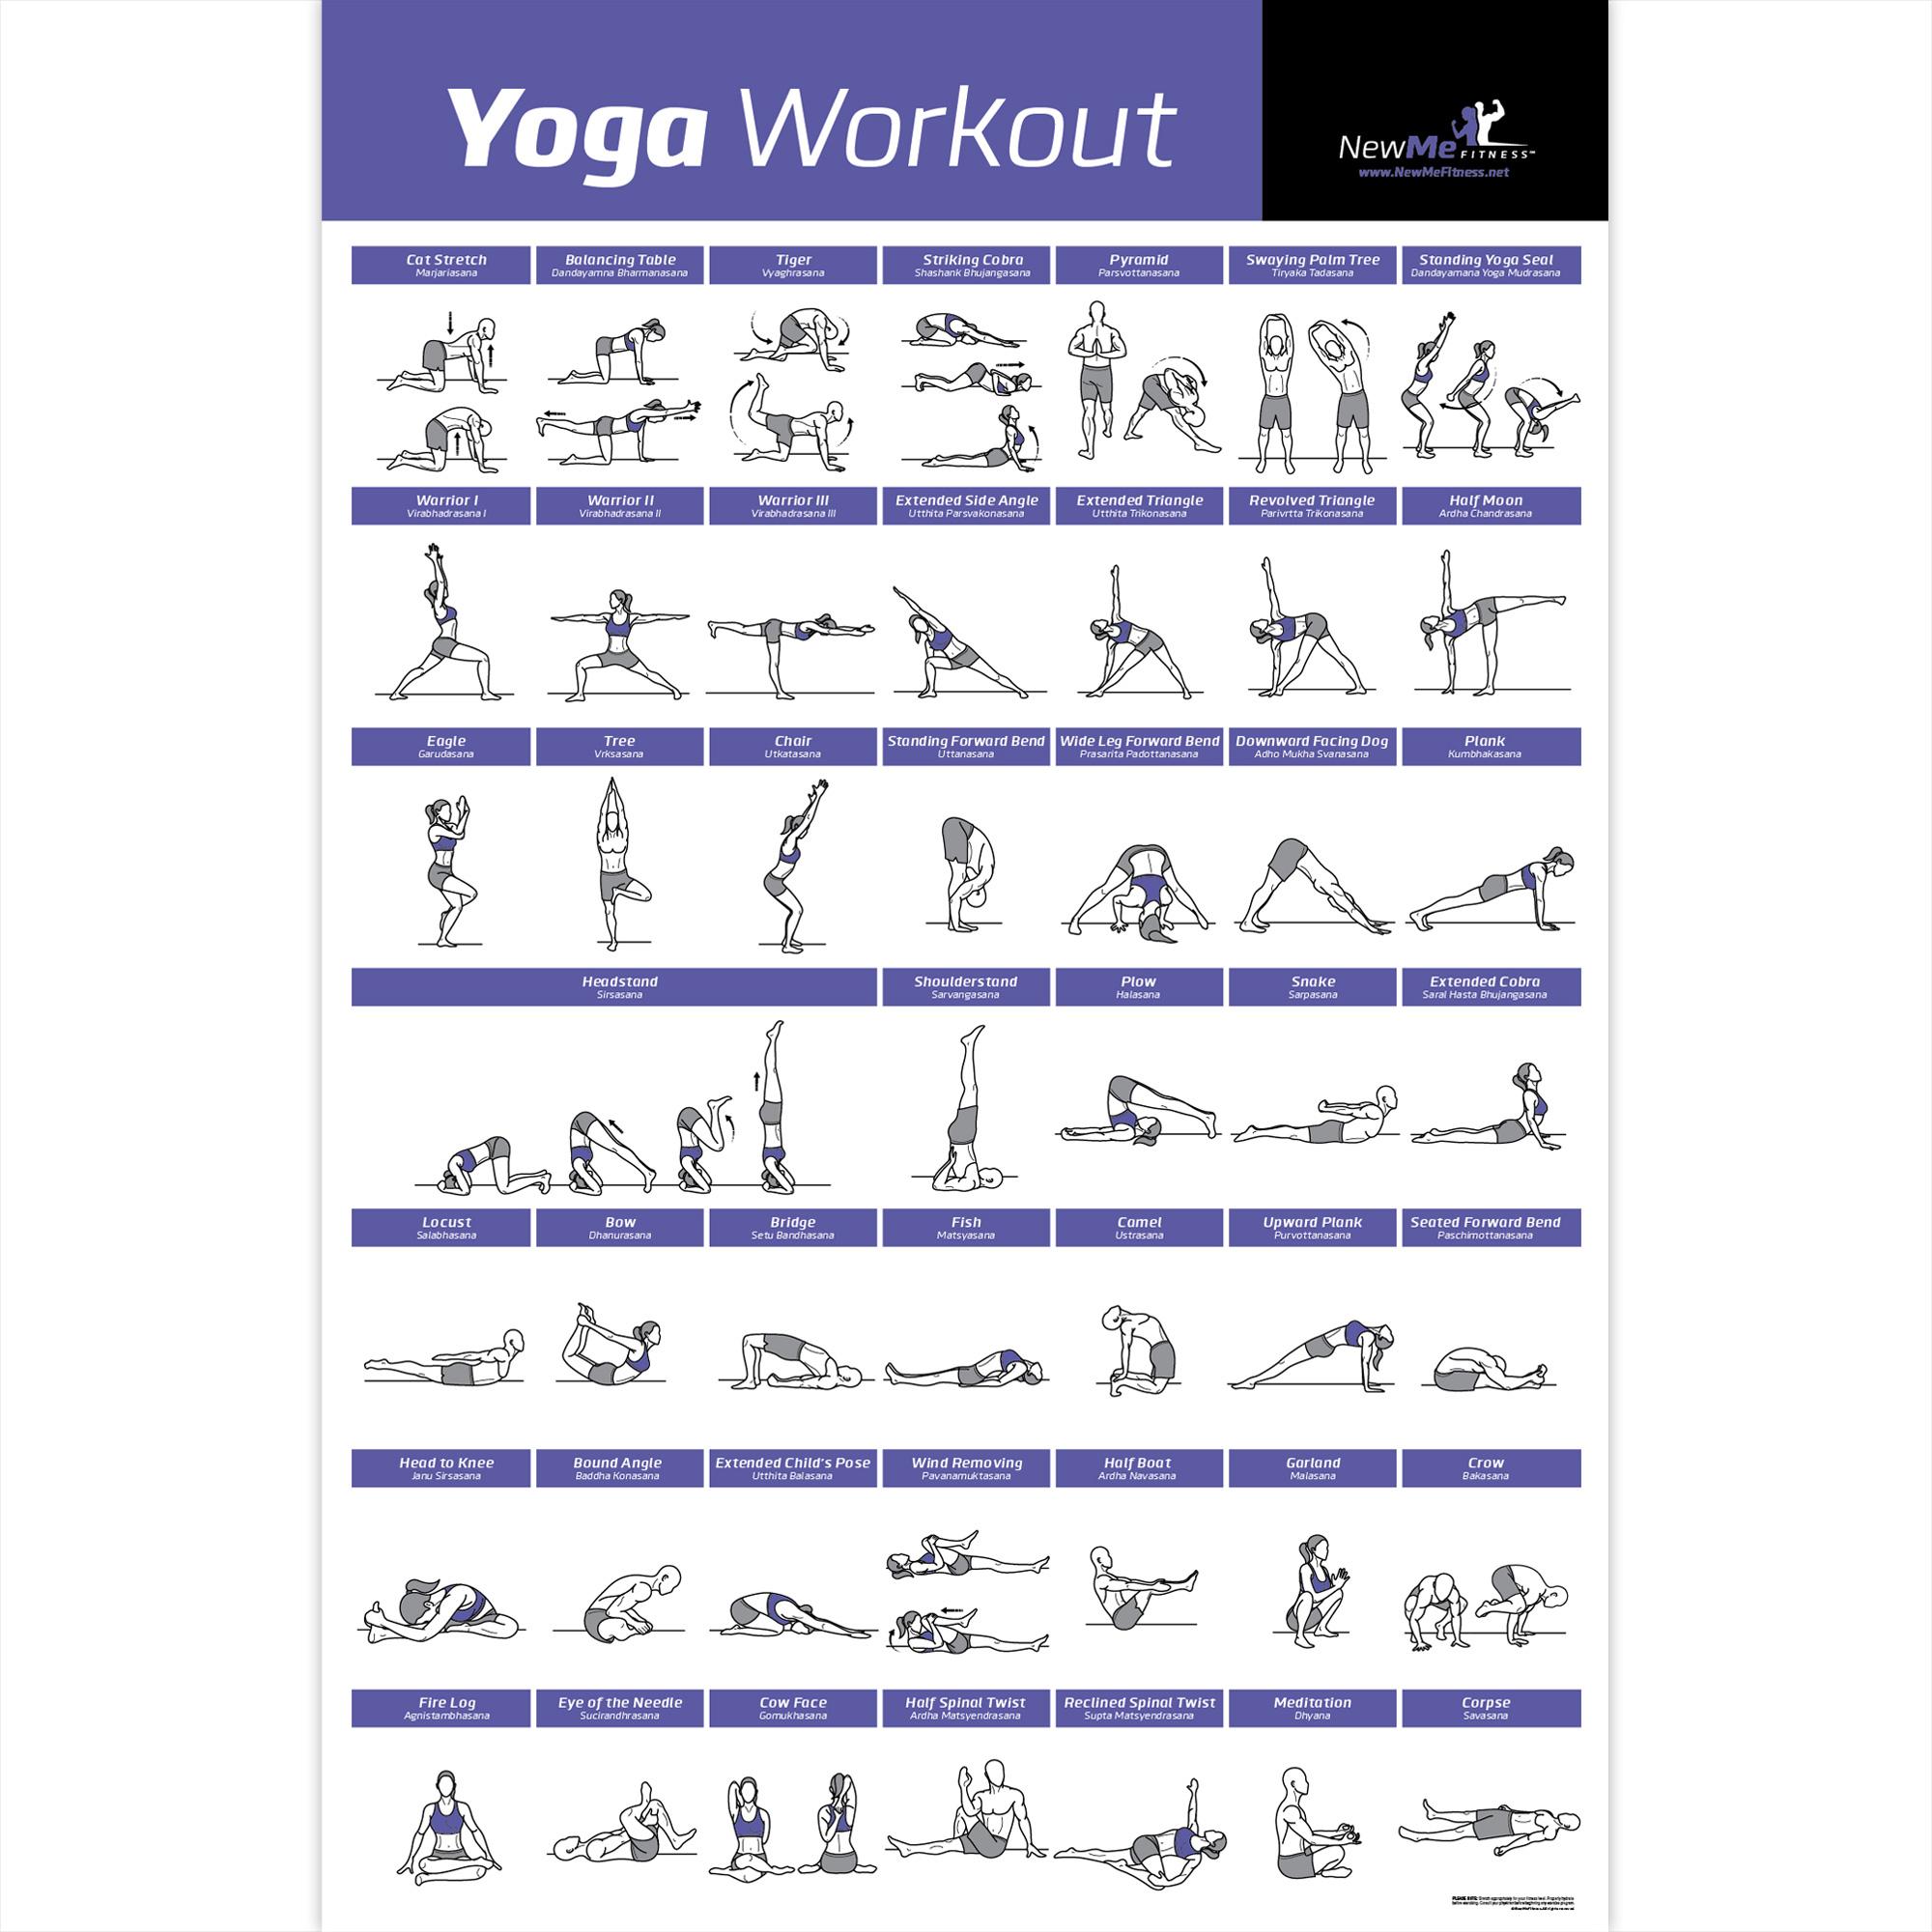 Pilates Mat Exercise Poster: NewMe Fitness Premieres New Yoga Workout Poster On Amazon